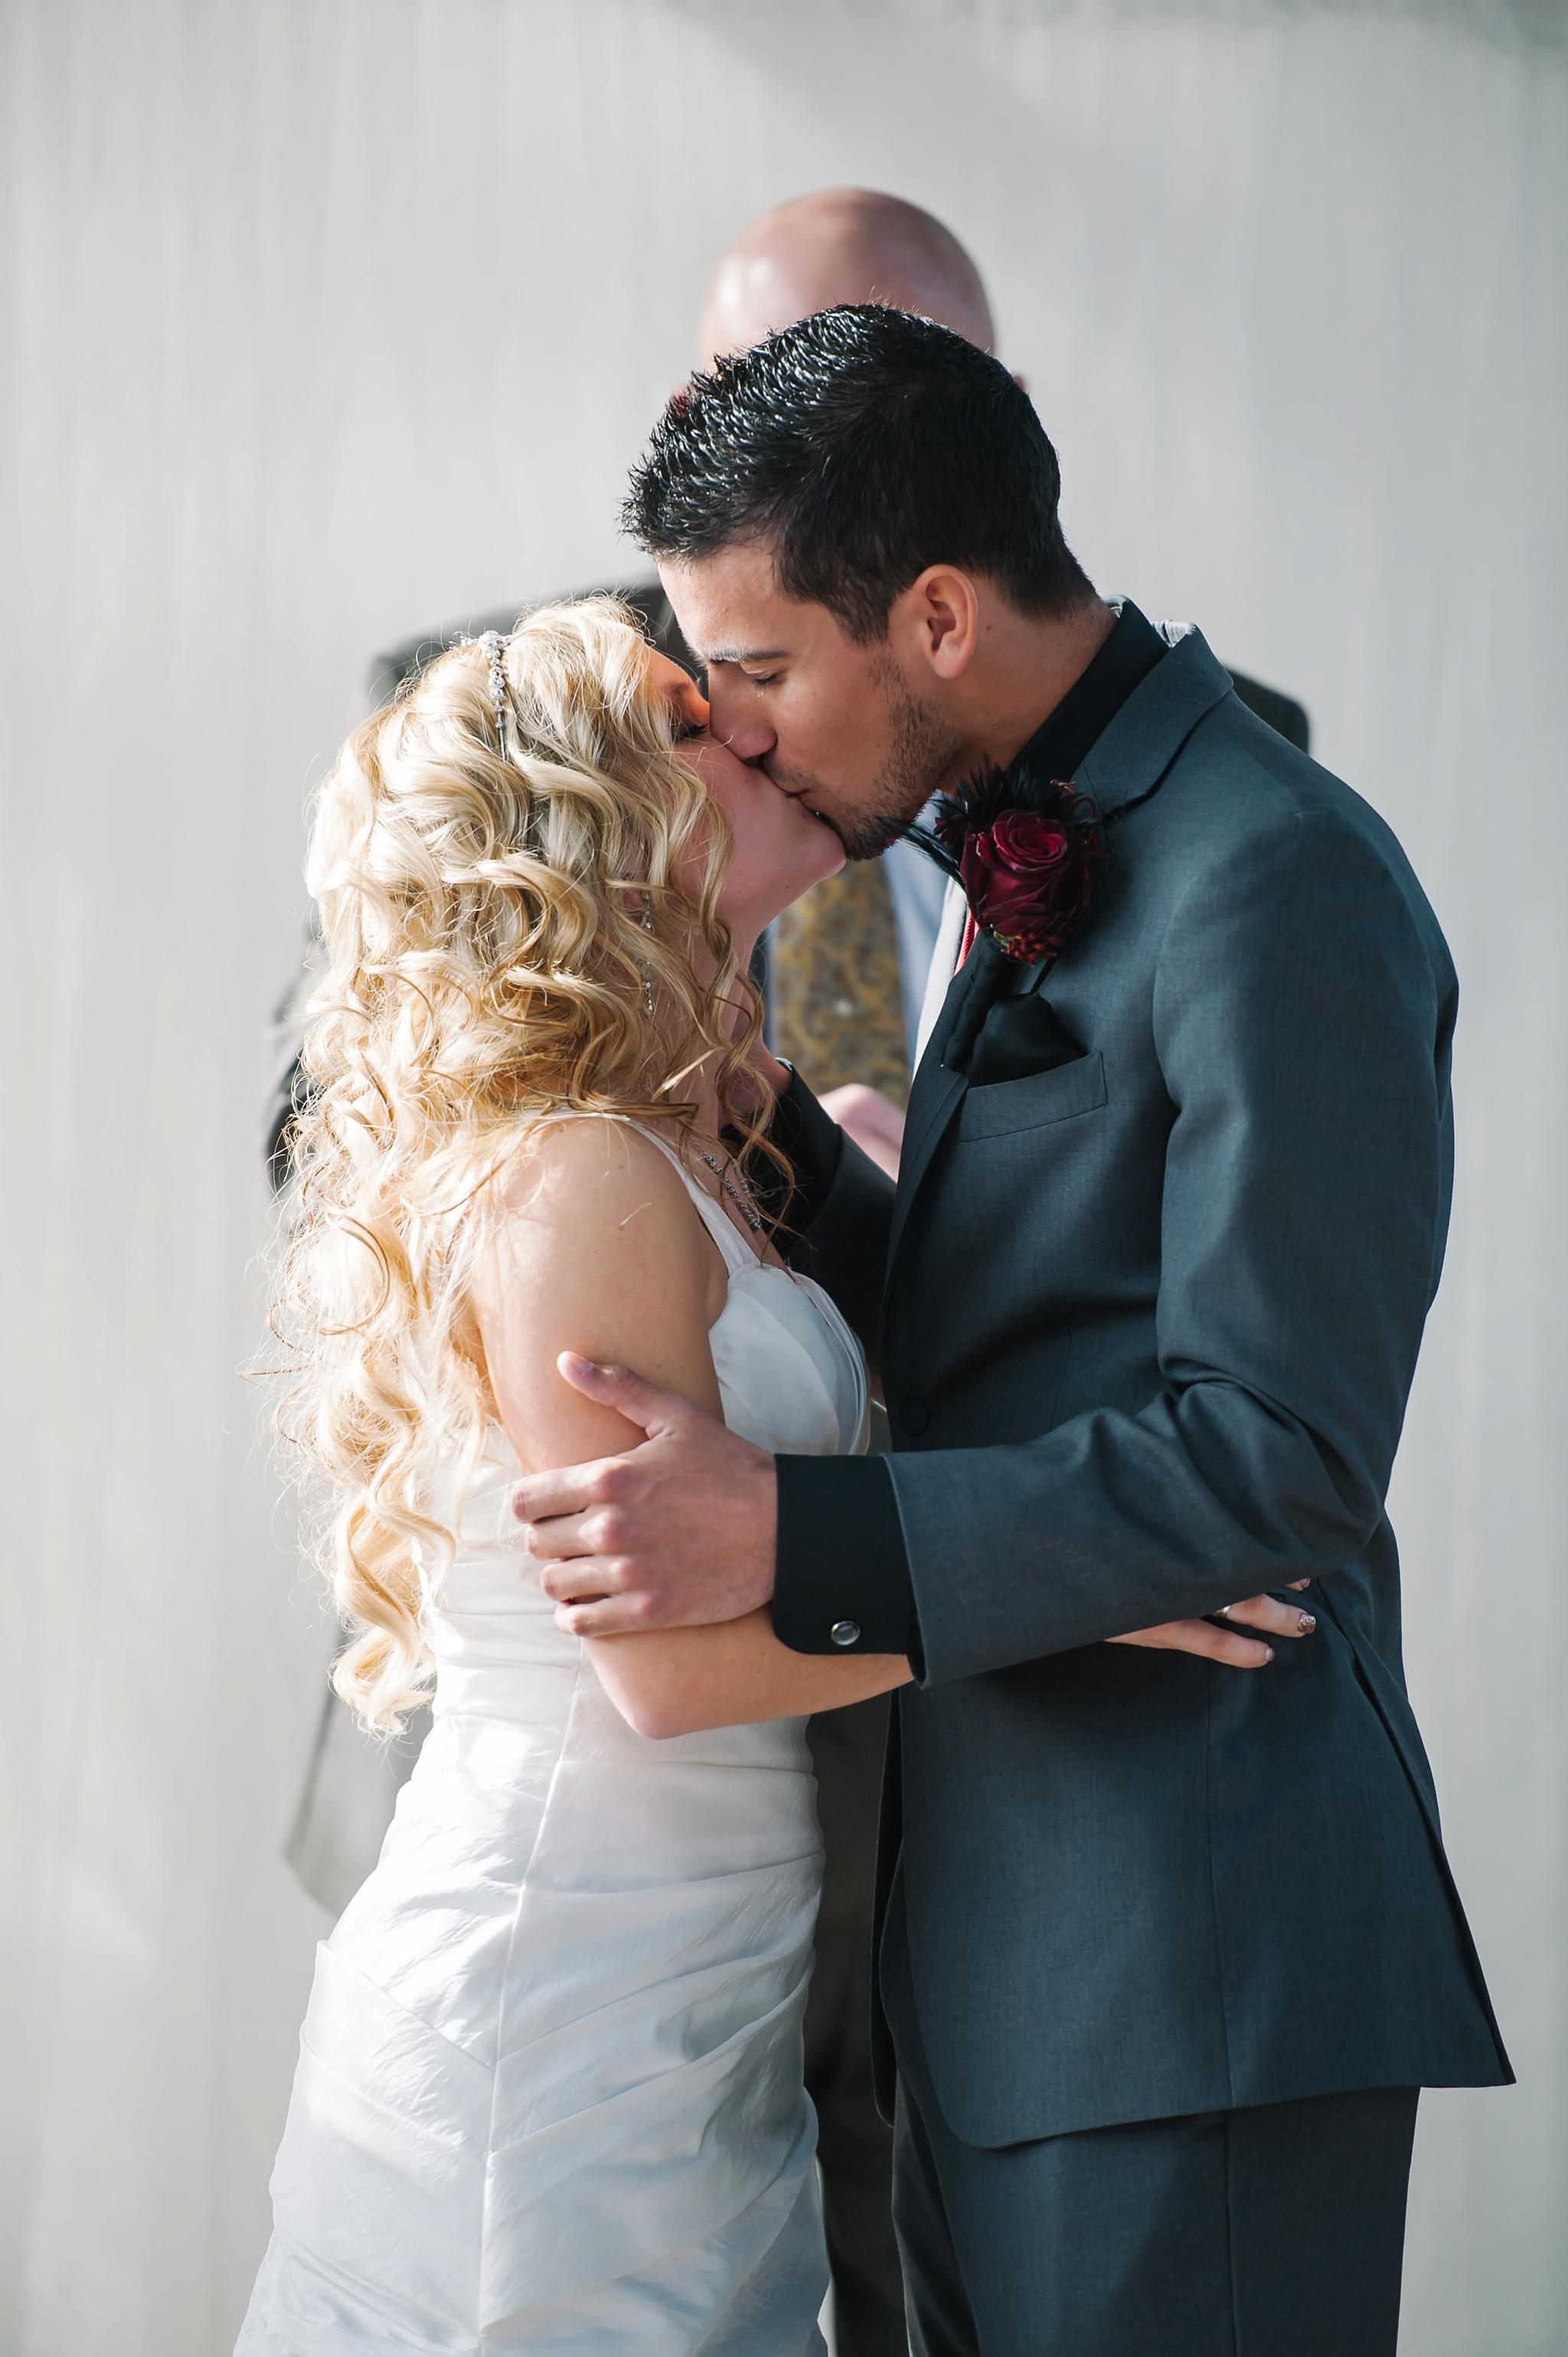 SLC Utah Wedding Photographer Ali Sumsion 028